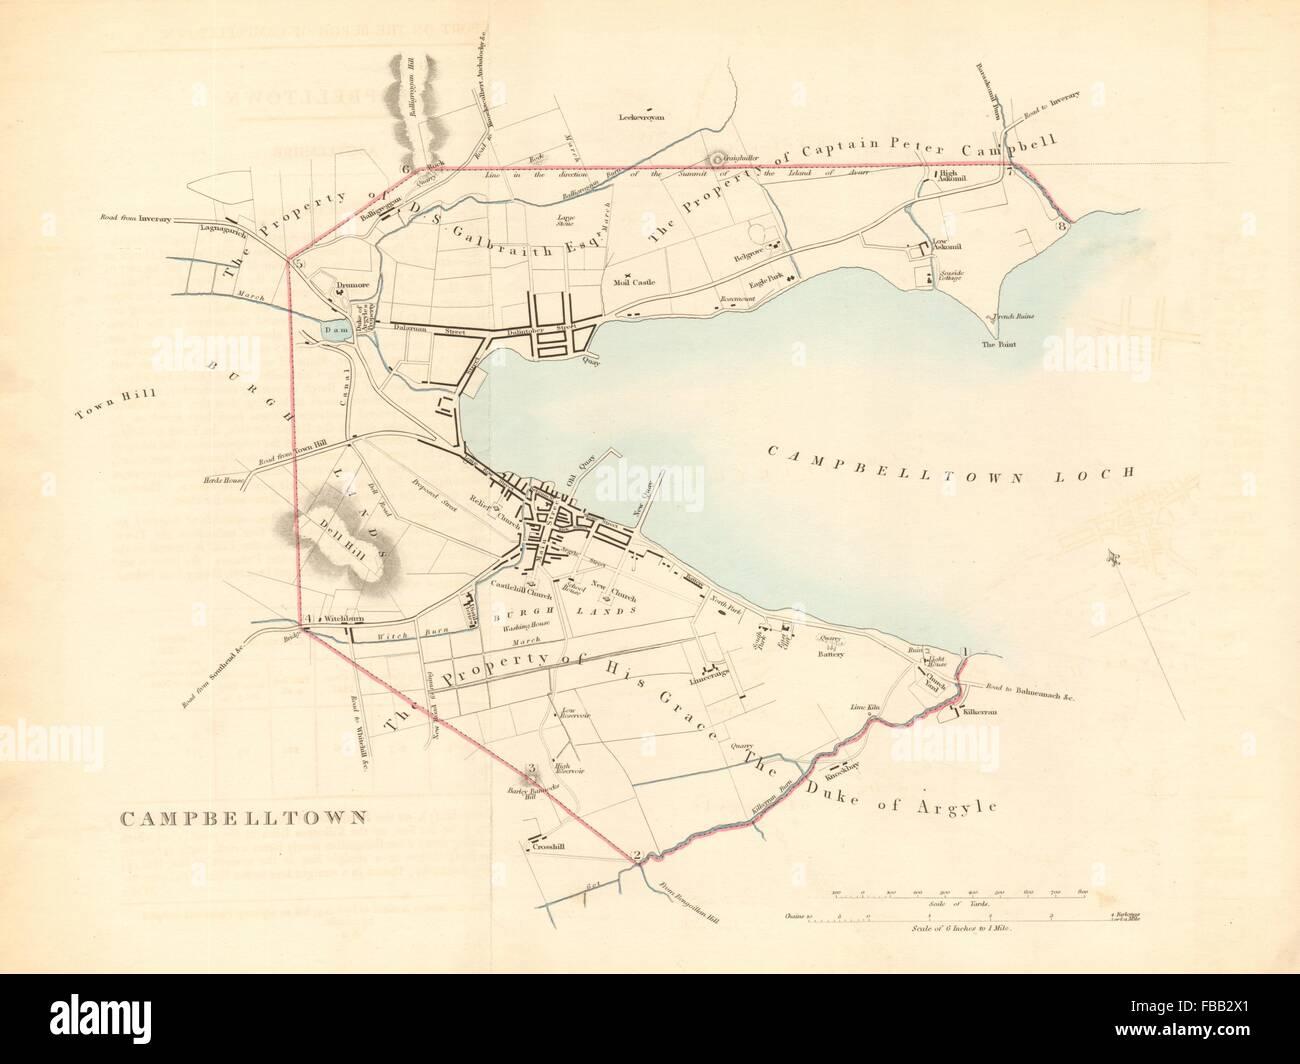 Campbeltown Scotland Map.Campbeltown Borough Town Plan Reform Act Campbelltown Scotland